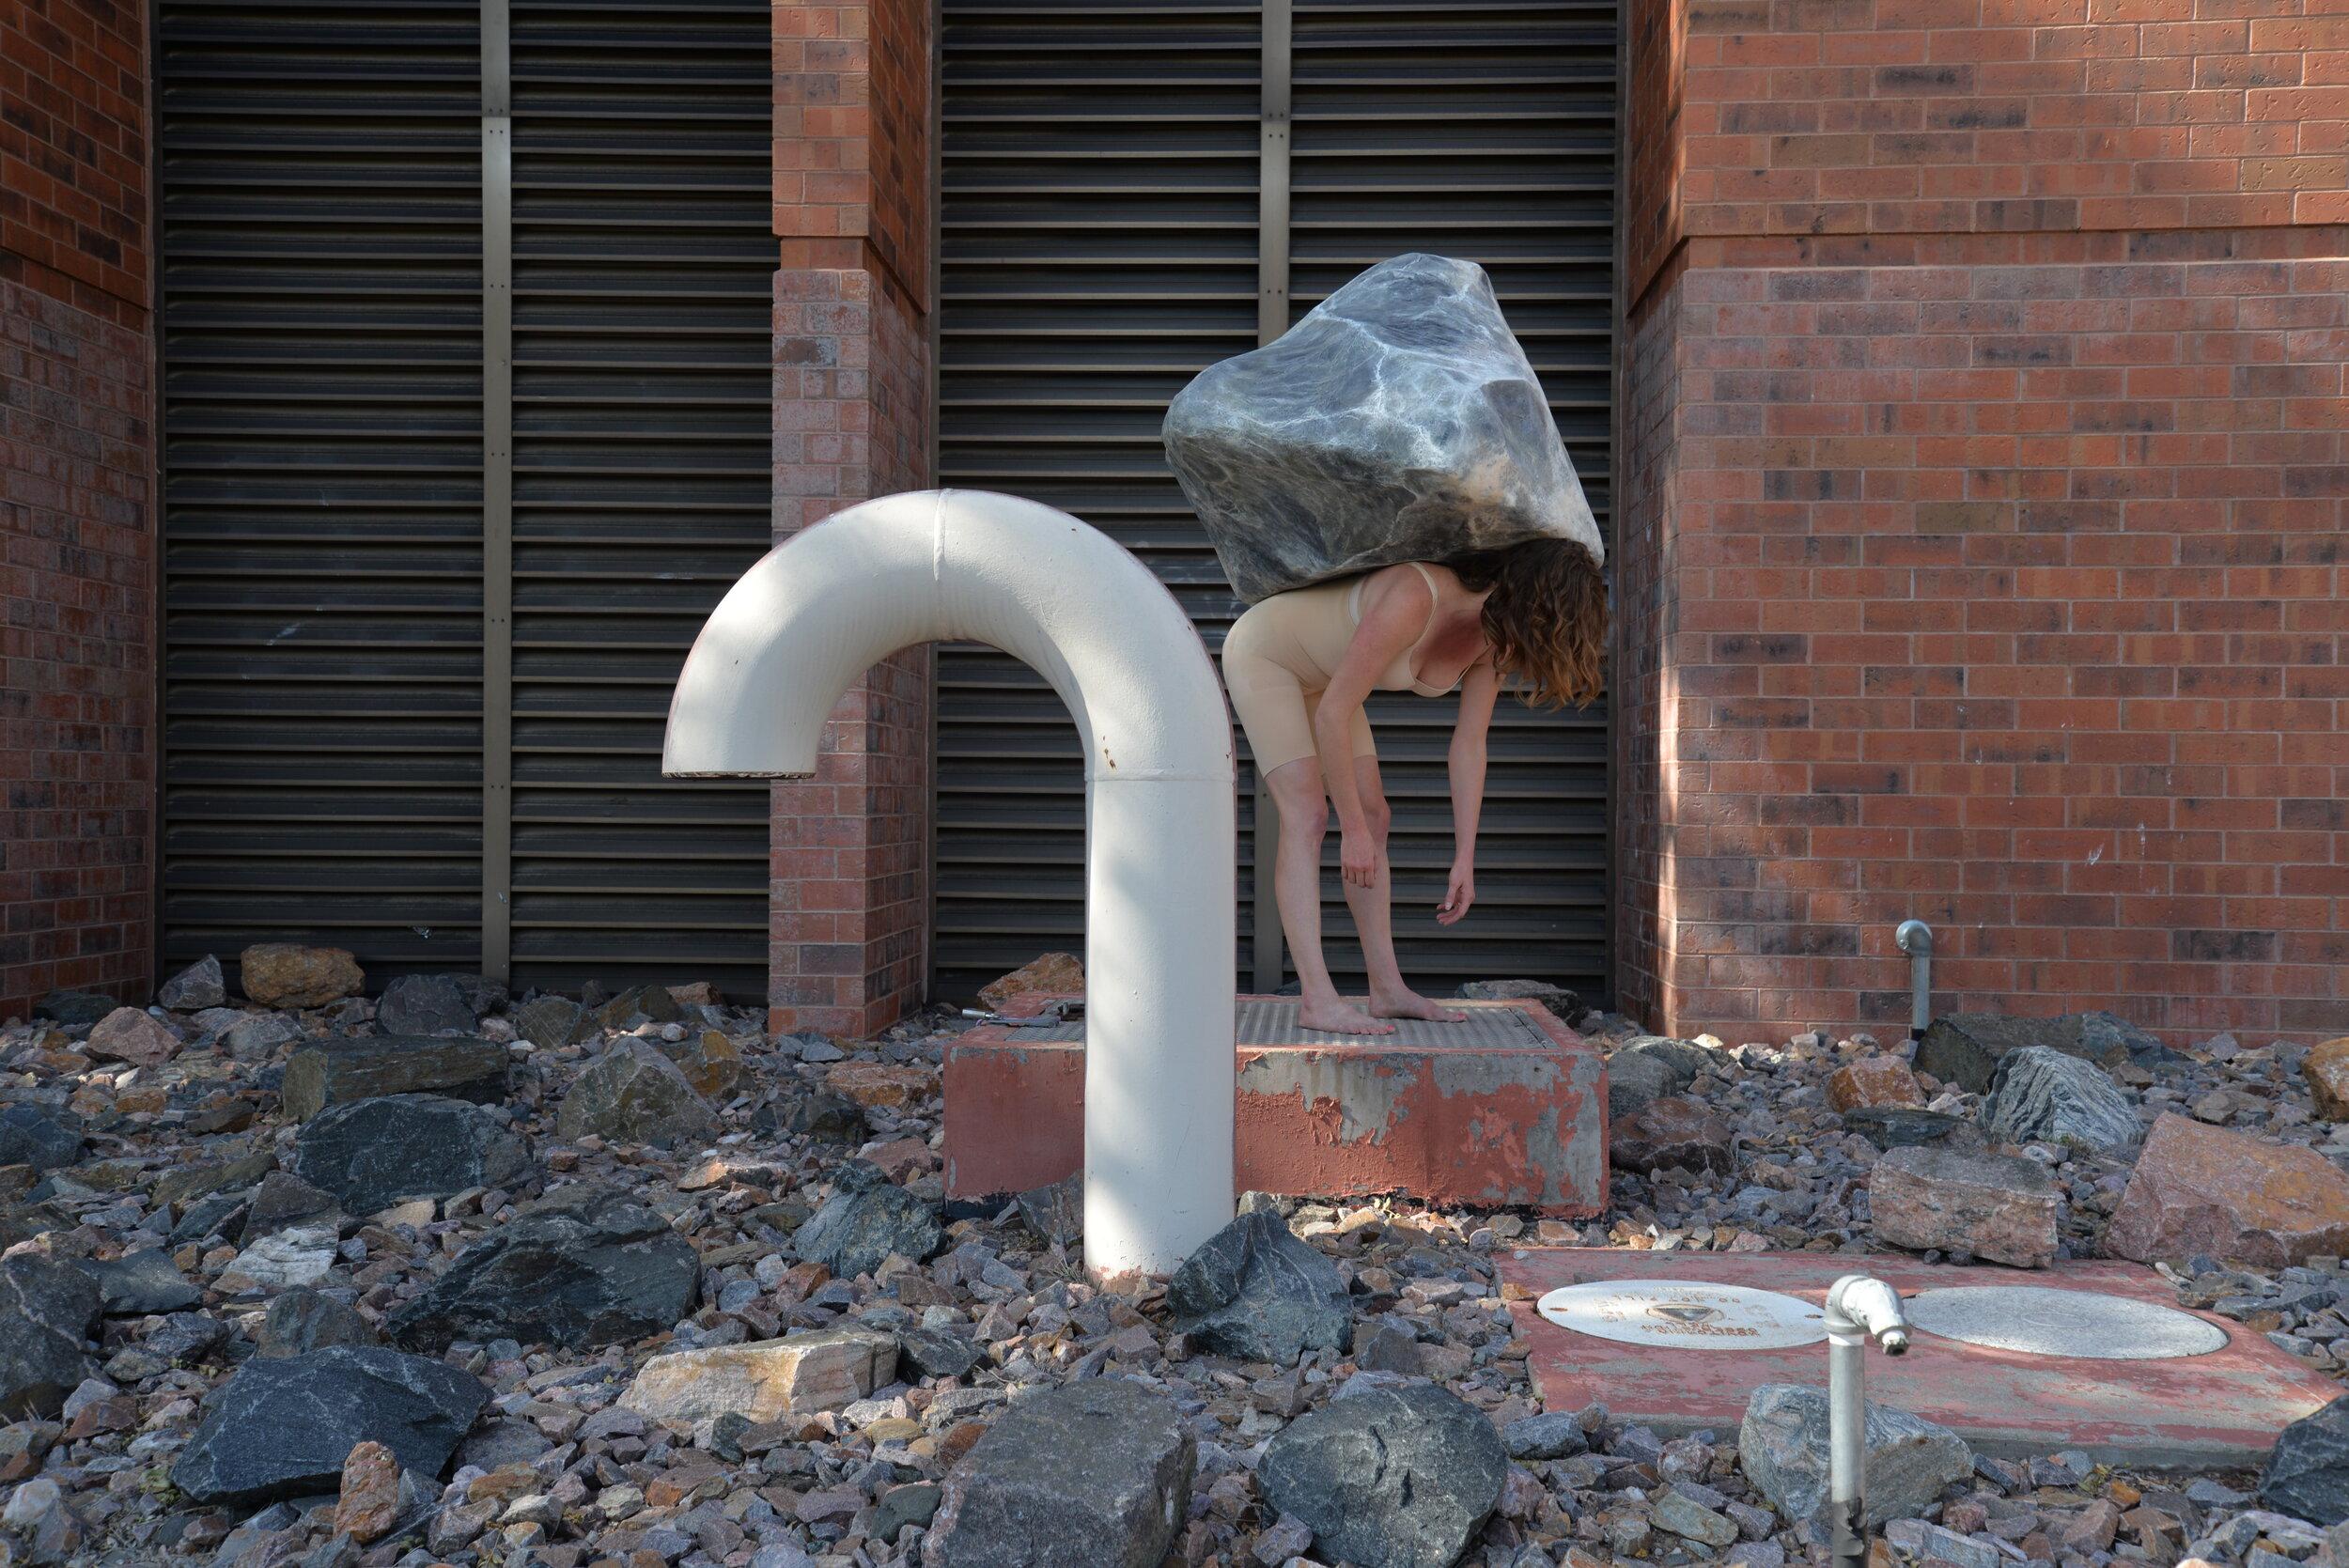 Schaefer Ordinary and Absurd_Brick.JPG